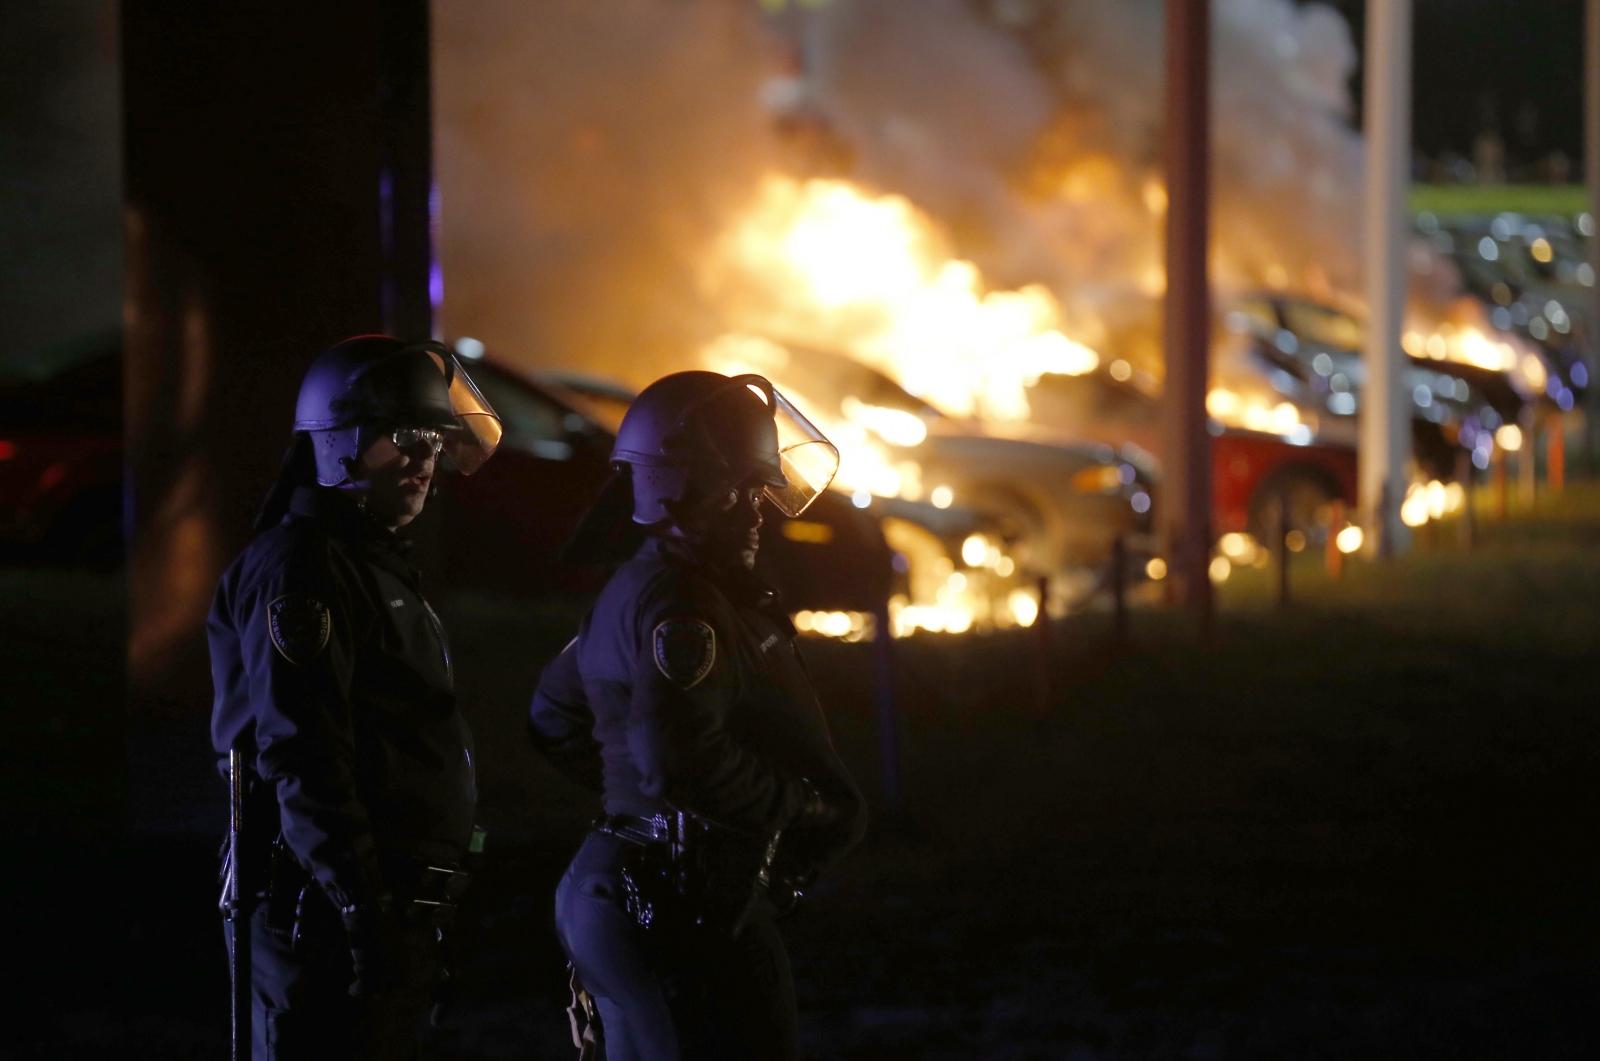 Ferguson Protests Car set on fire